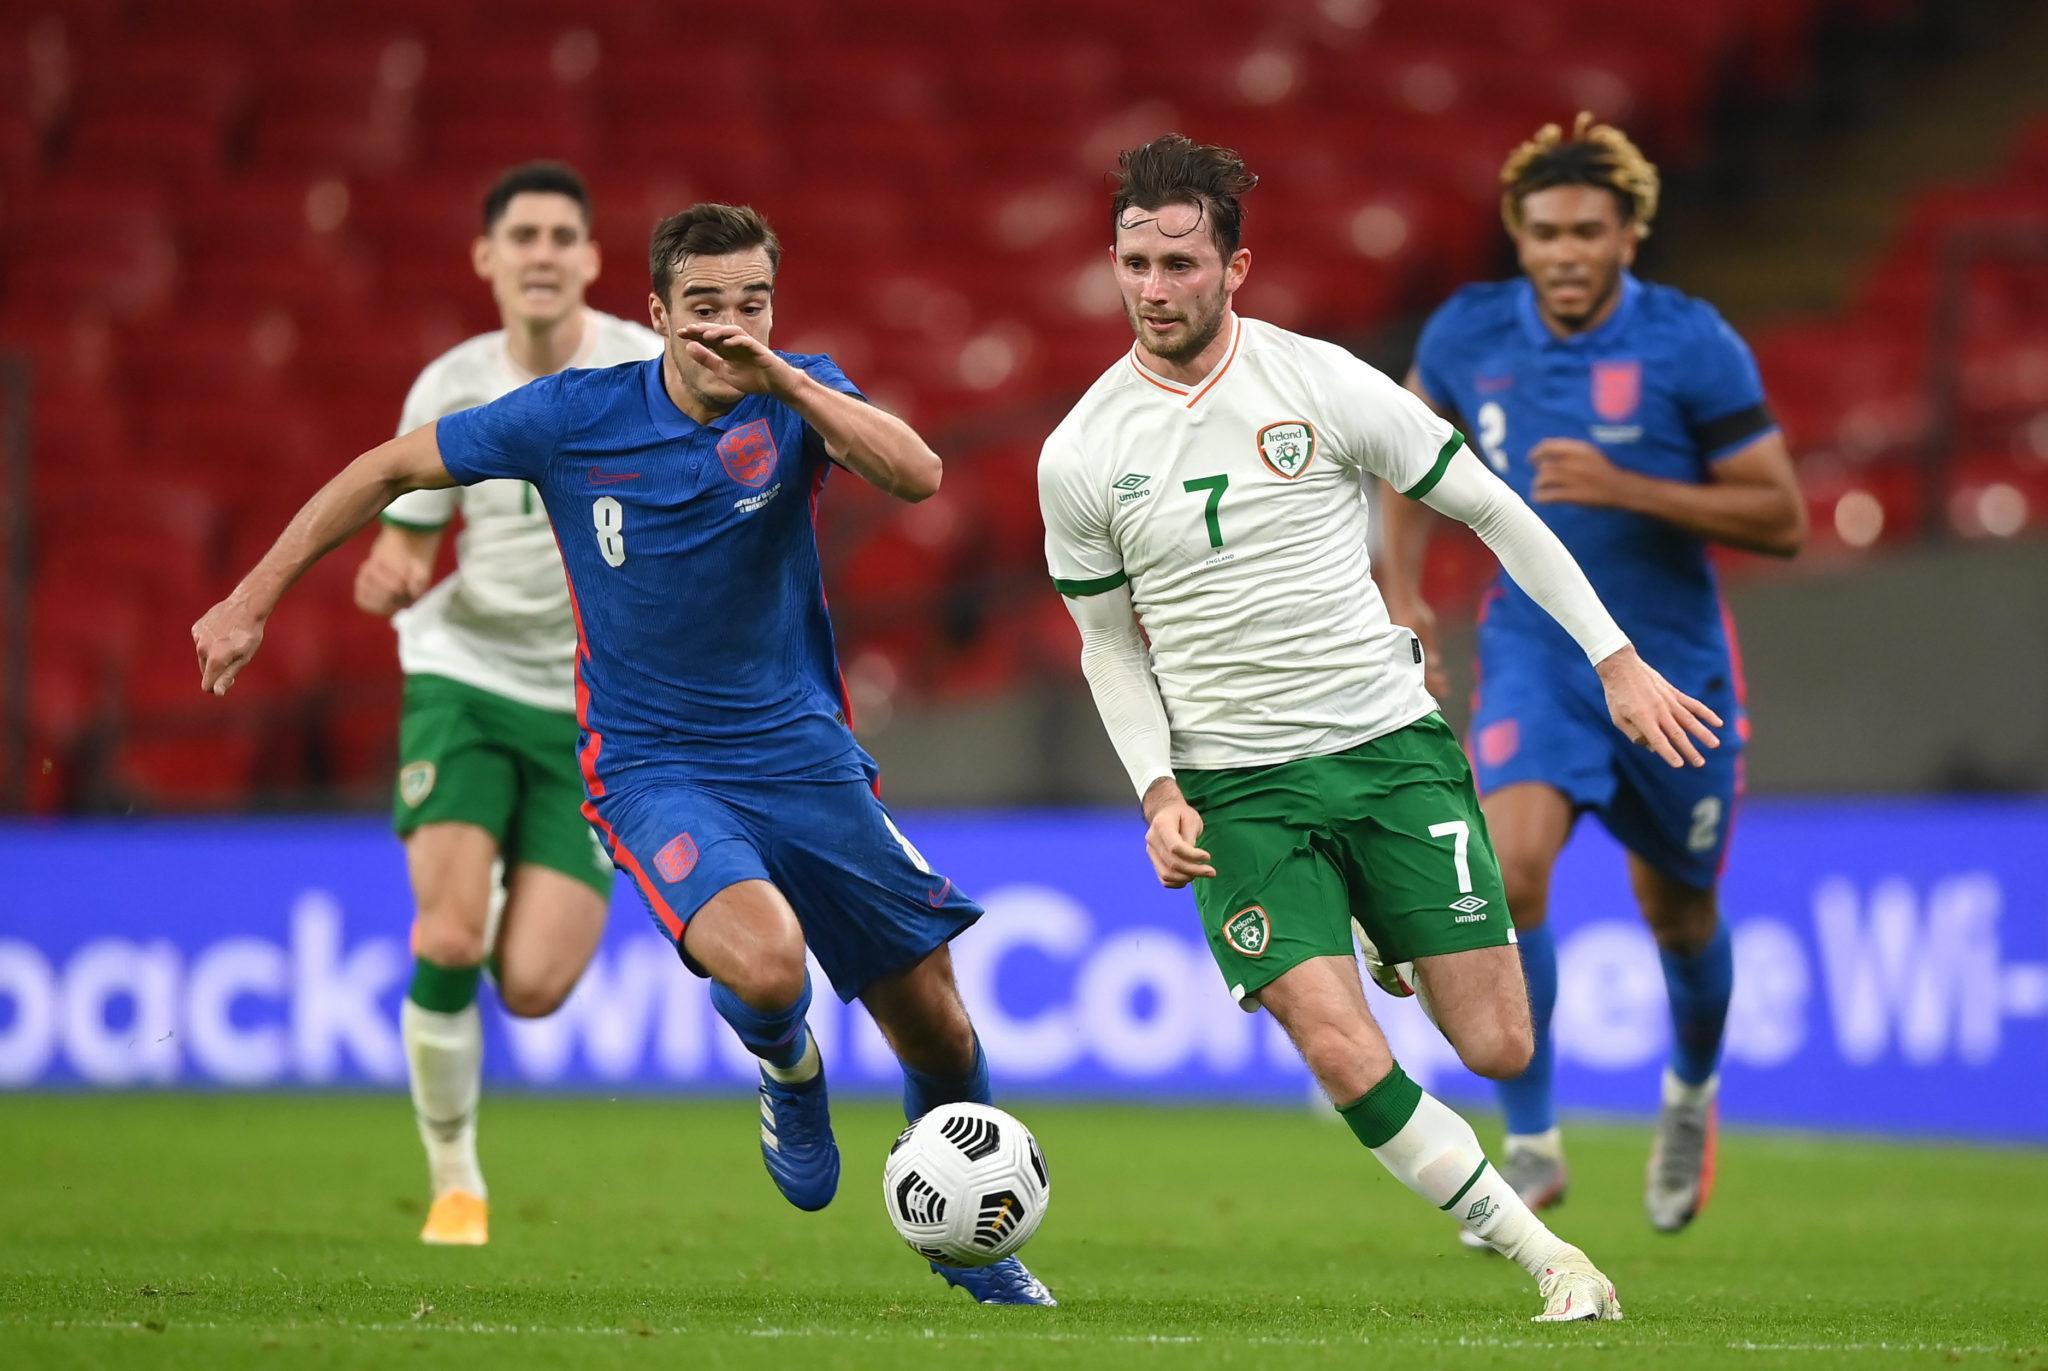 Republic of Ireland footballer Alan Browne had coronavirus during match against England